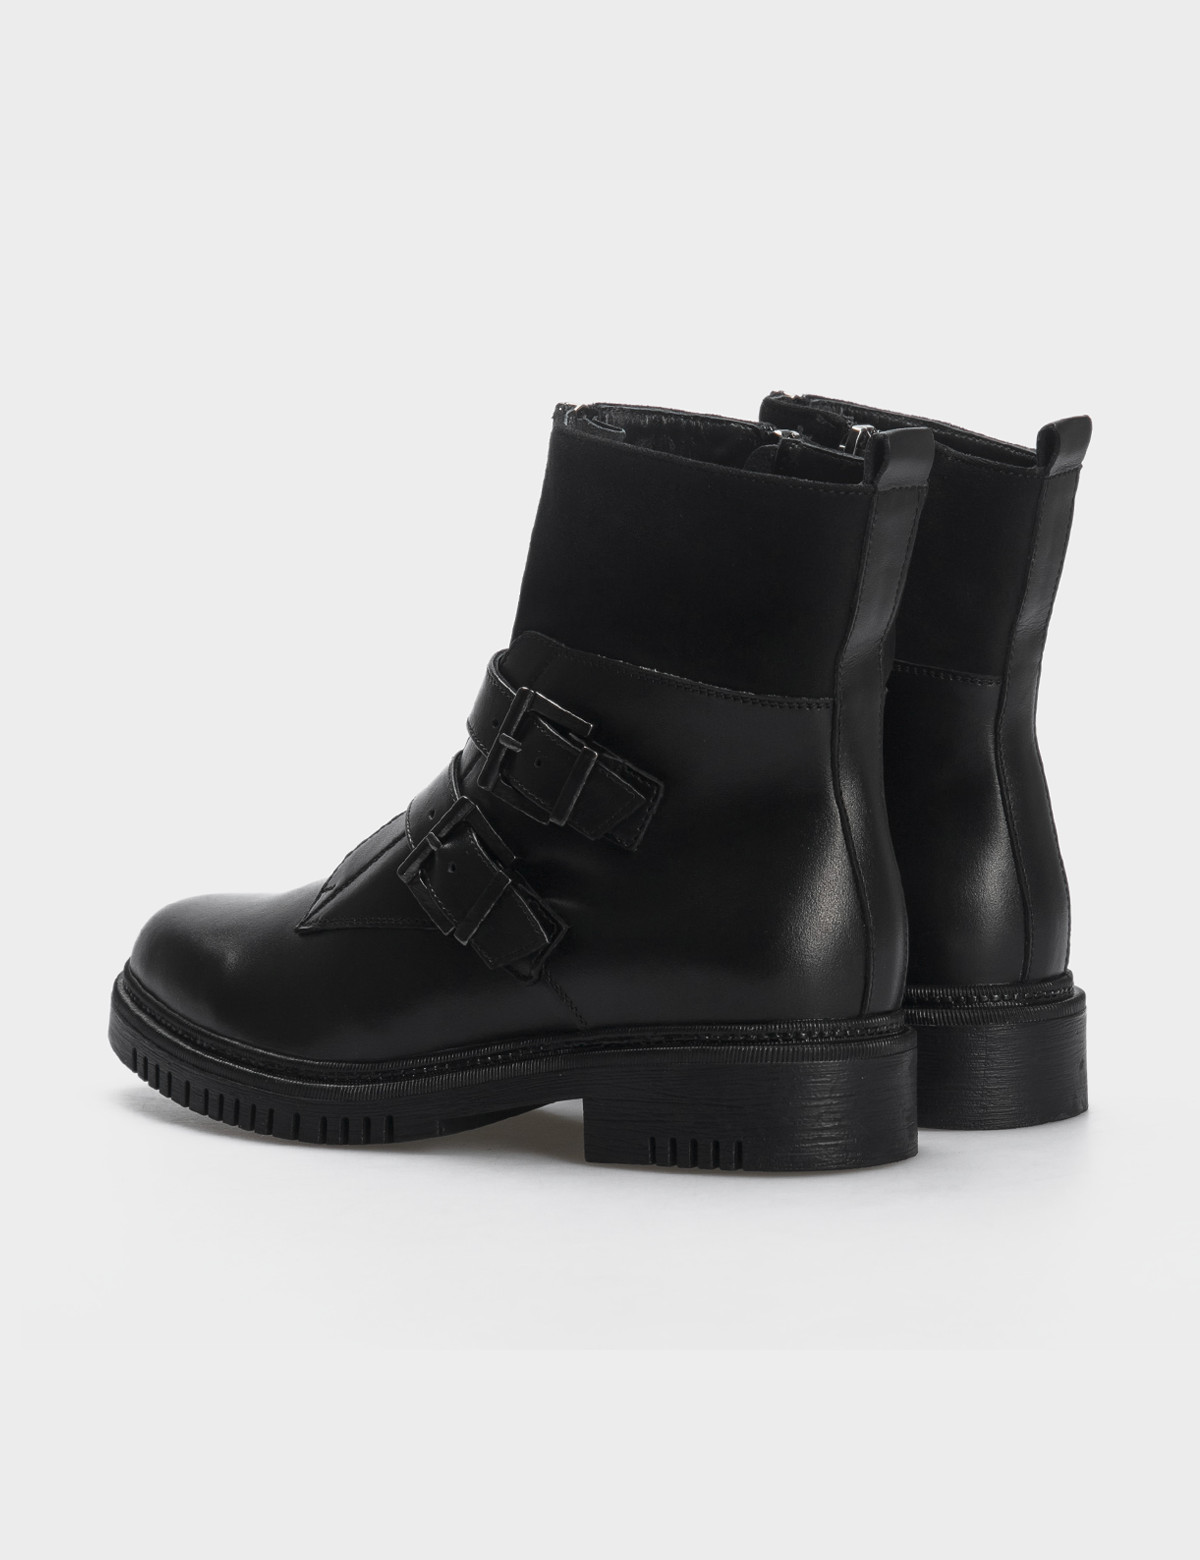 Ботинки, натуральная кожа/замша. Байка2